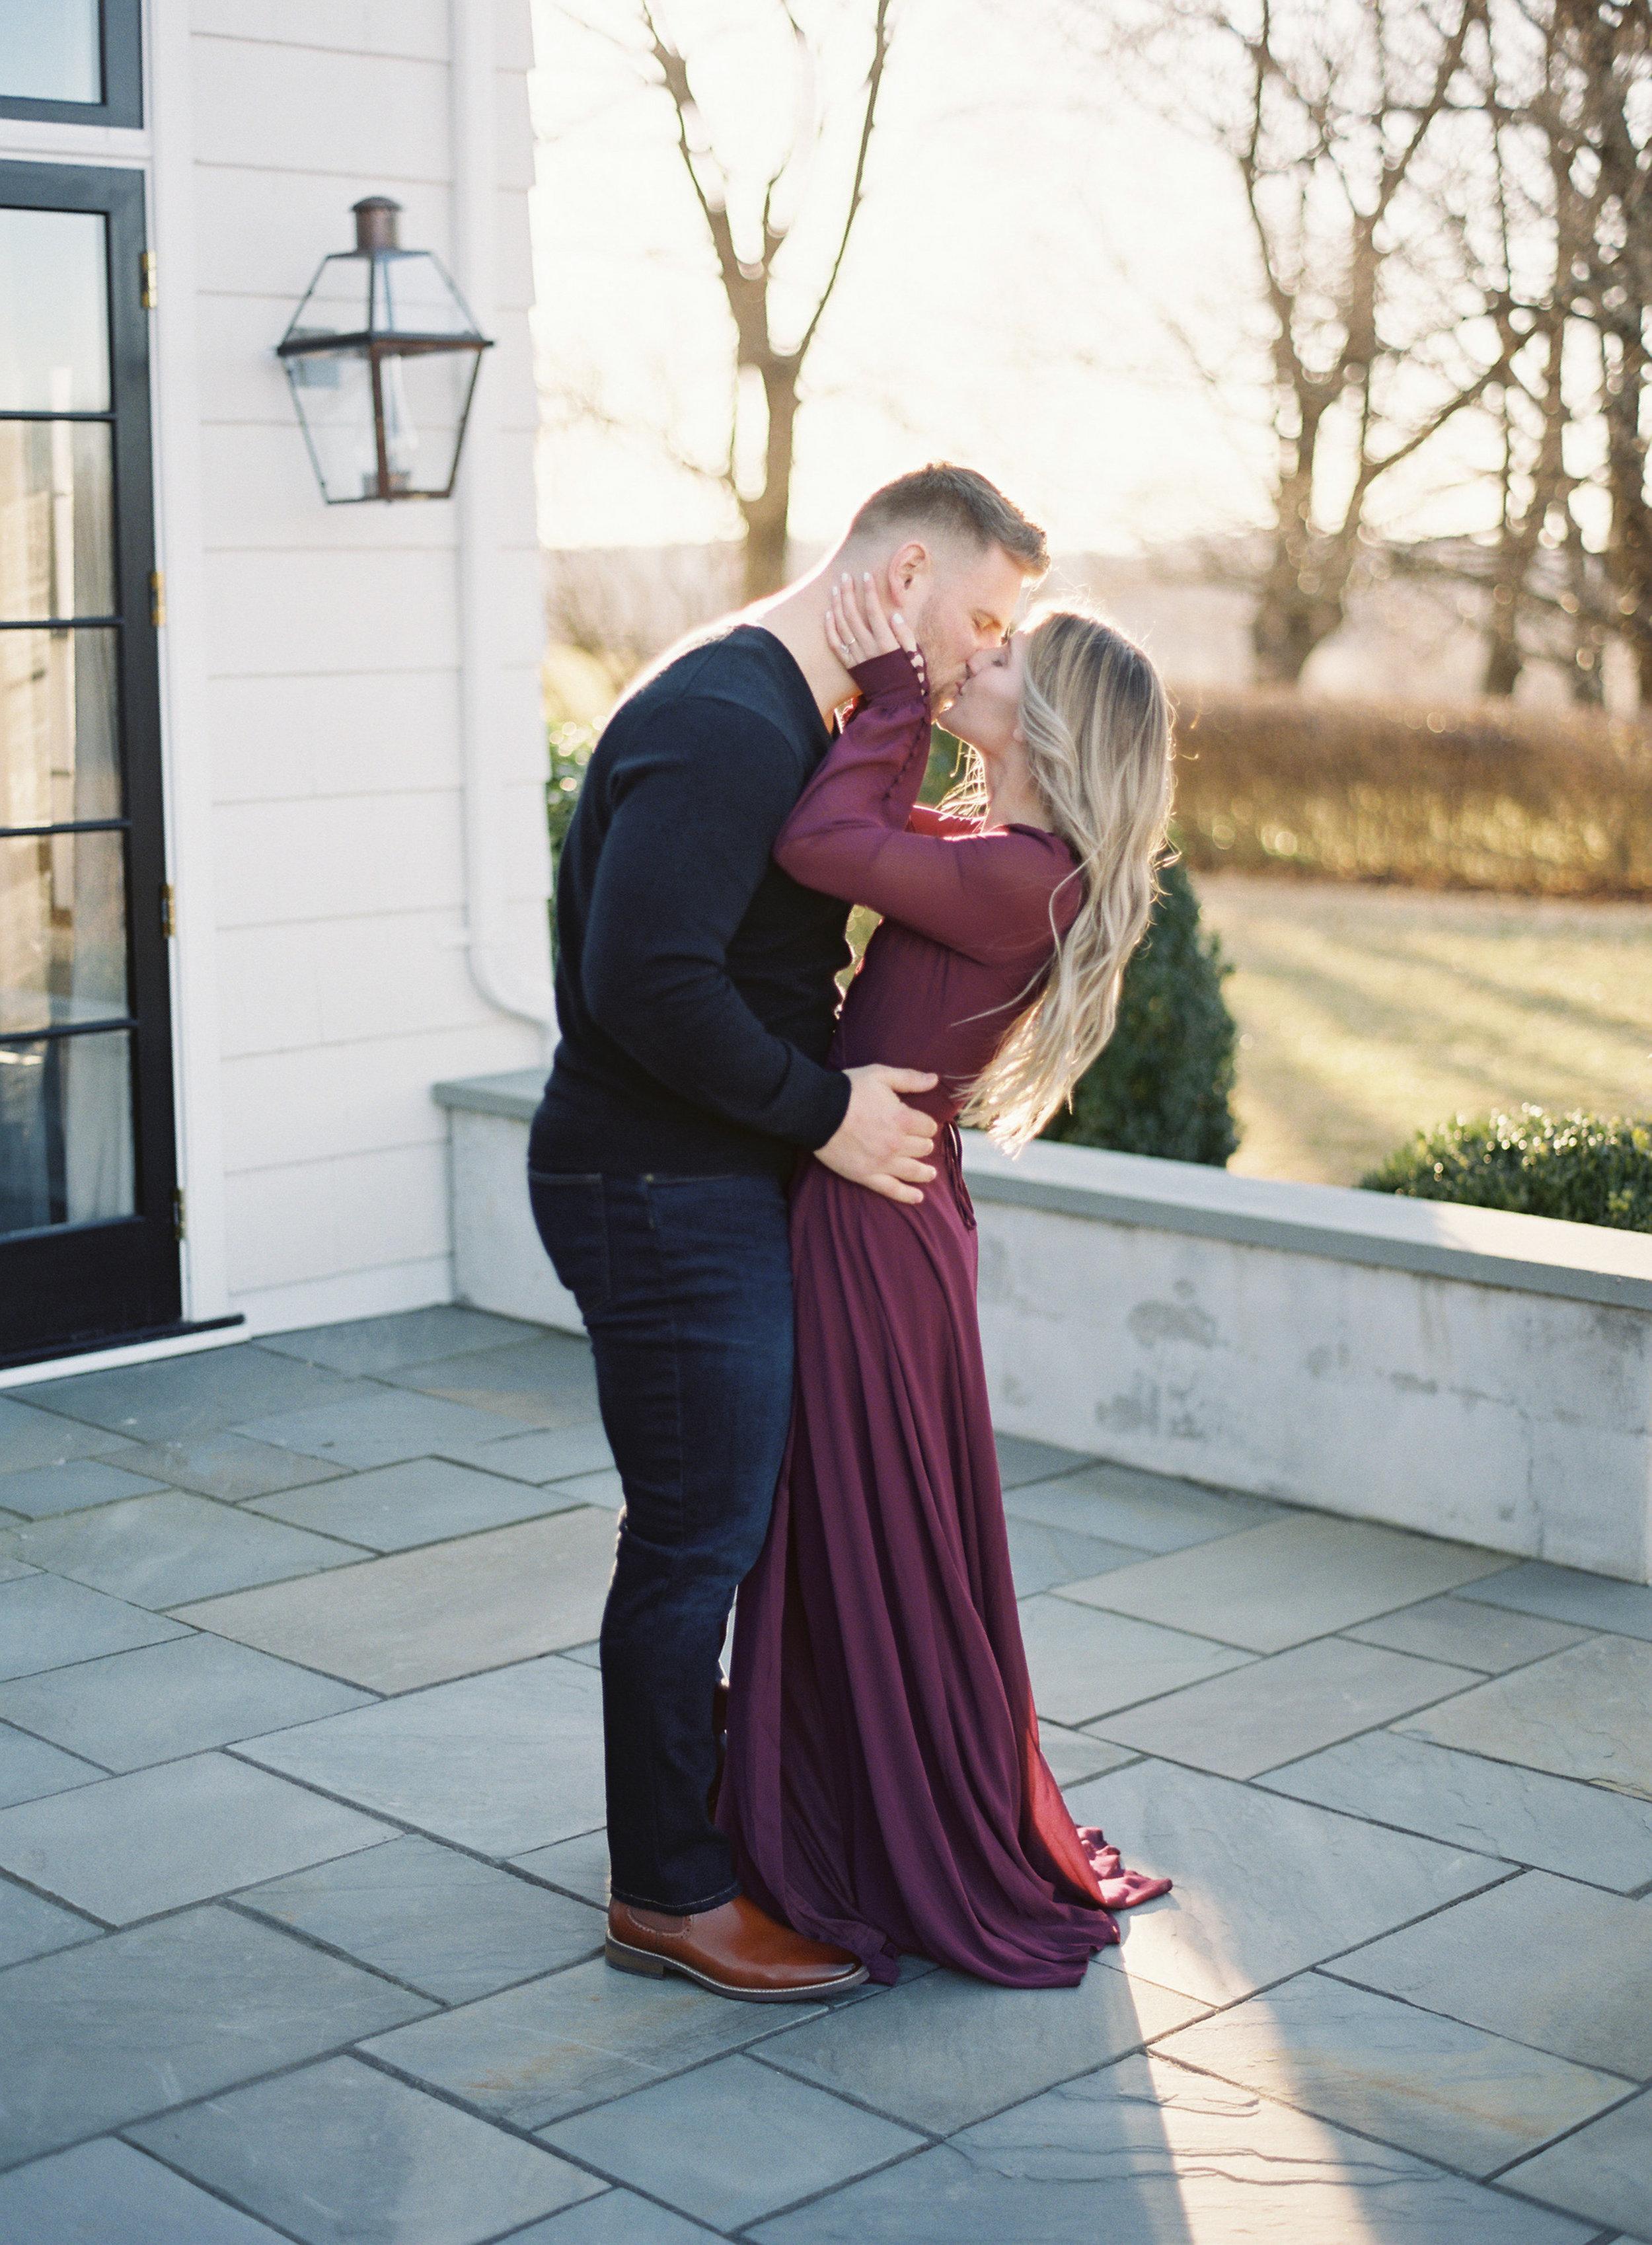 Mike & Kirsten February 2019 Engagement-0012.jpg